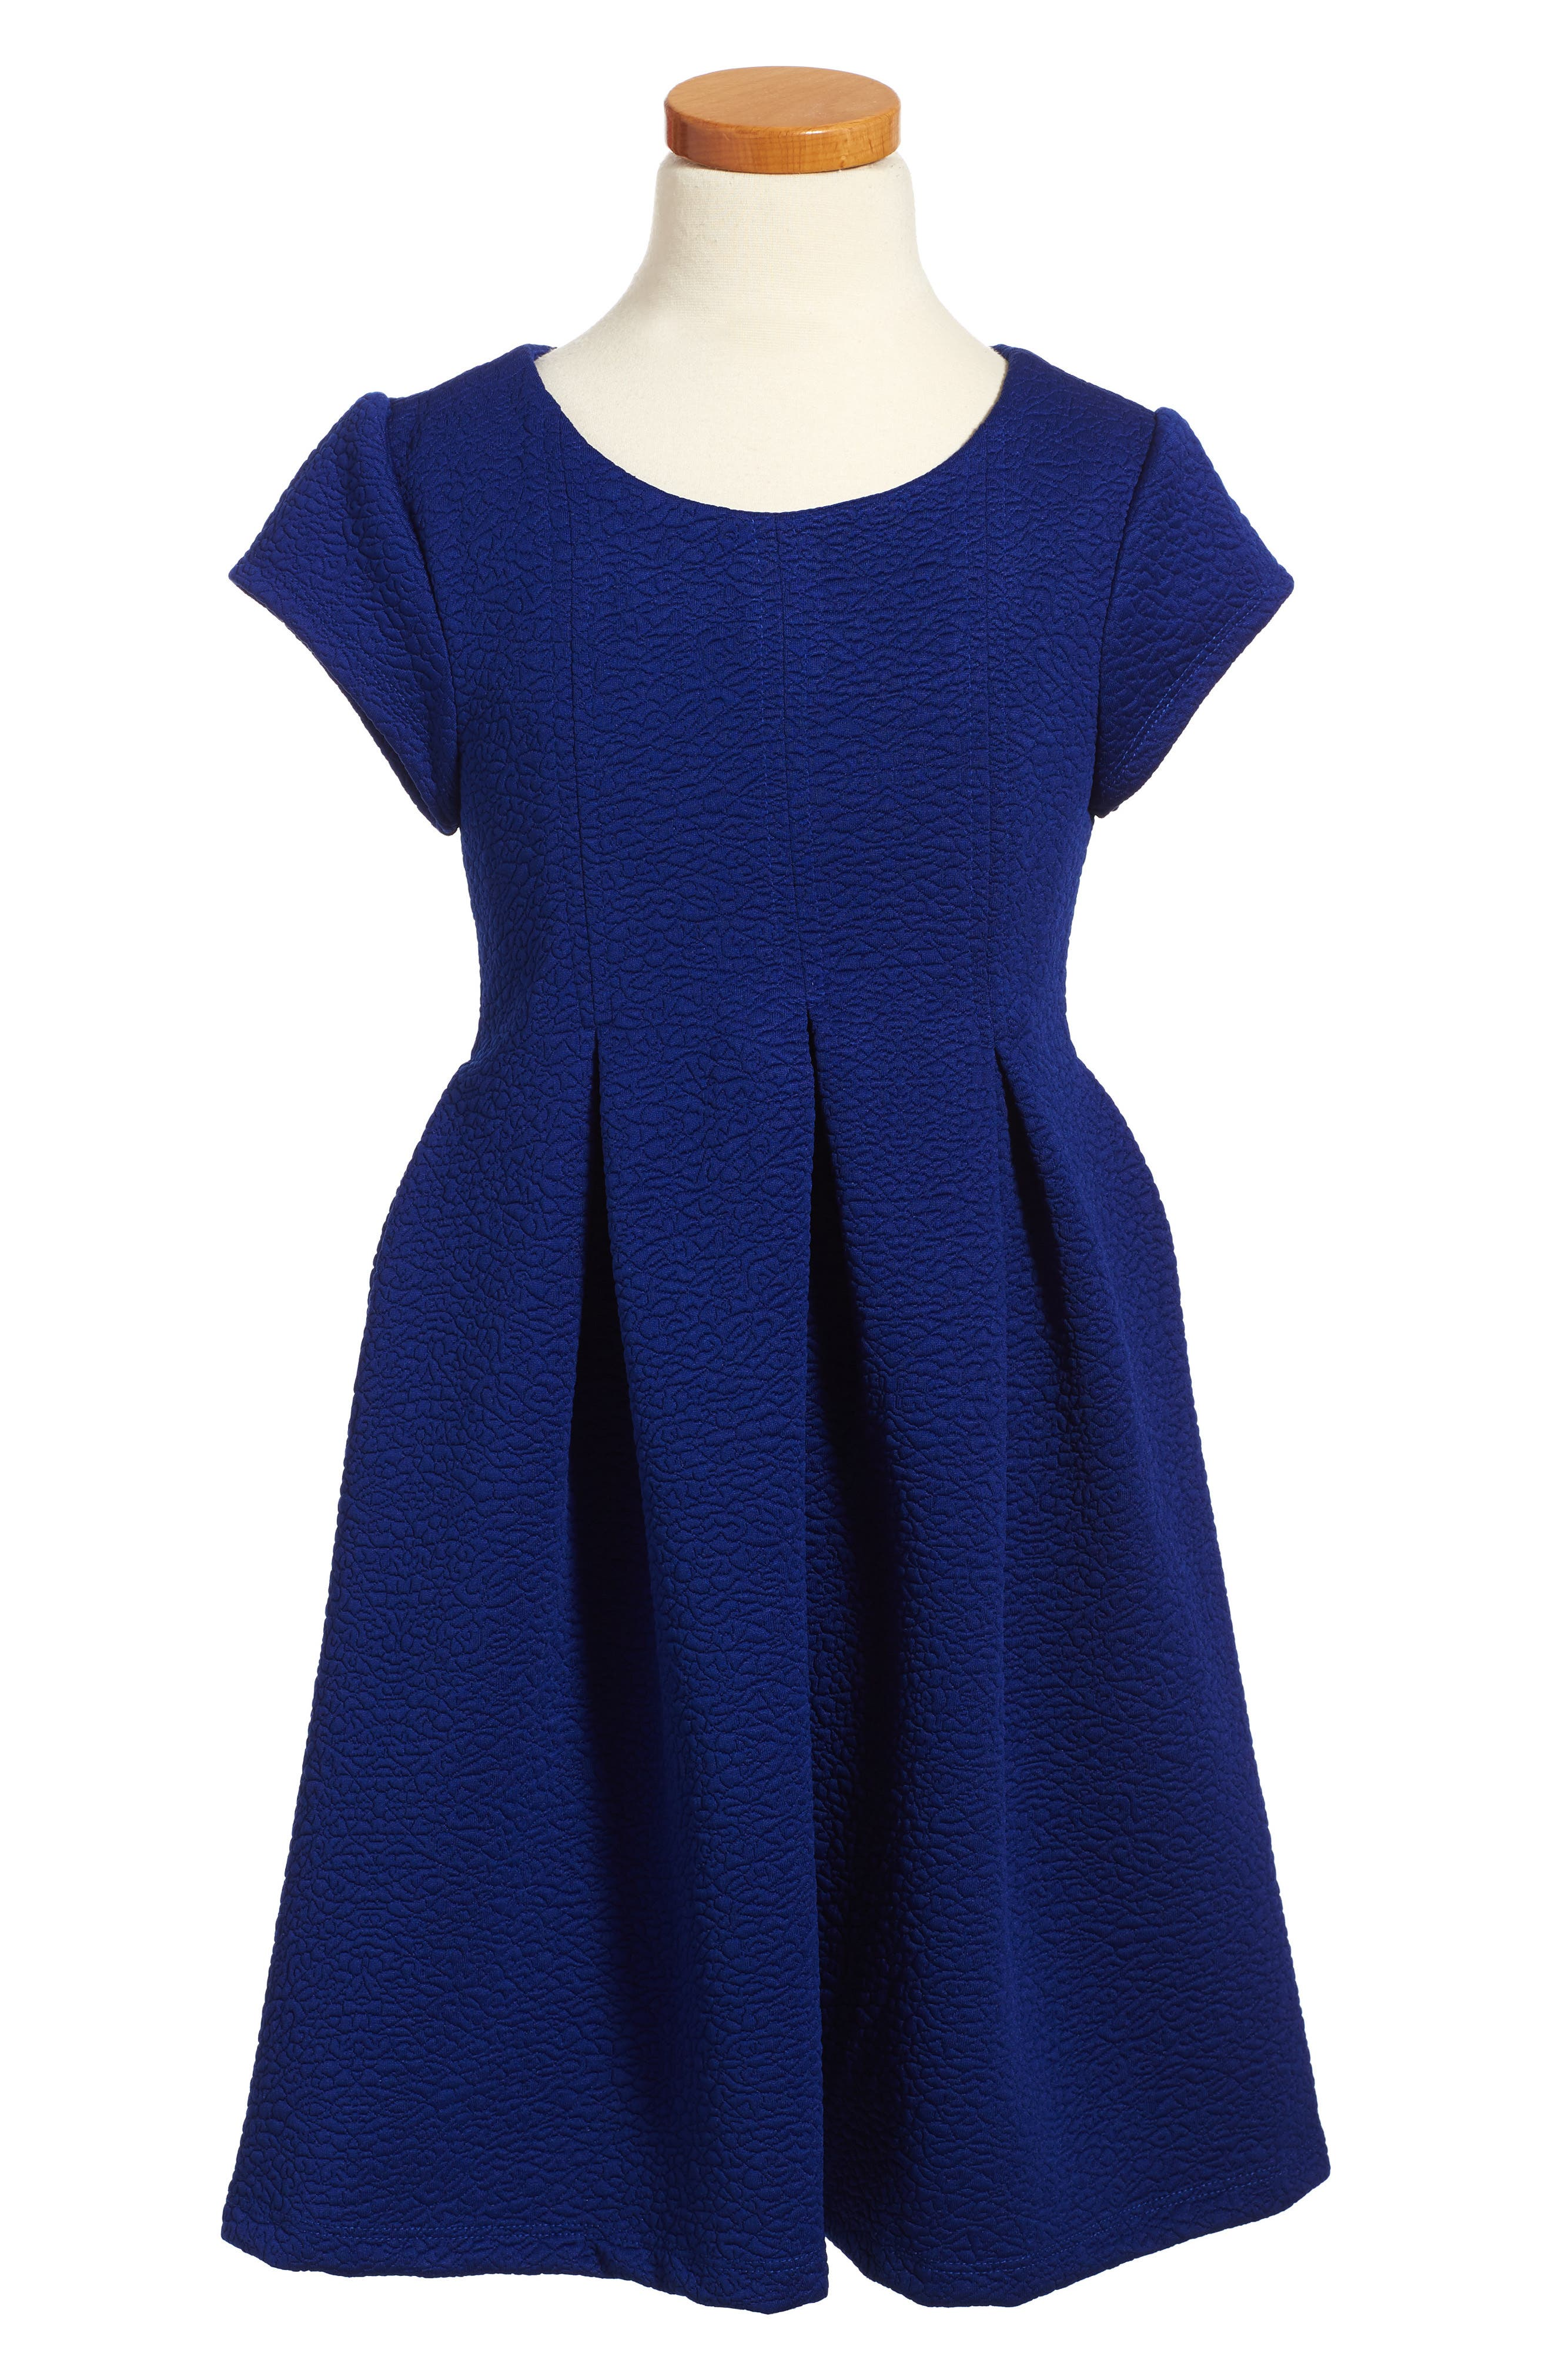 Main Image - Iris & Ivy Pleated Knit Dress (Toddler Girls, Little Girls & Big Girls)